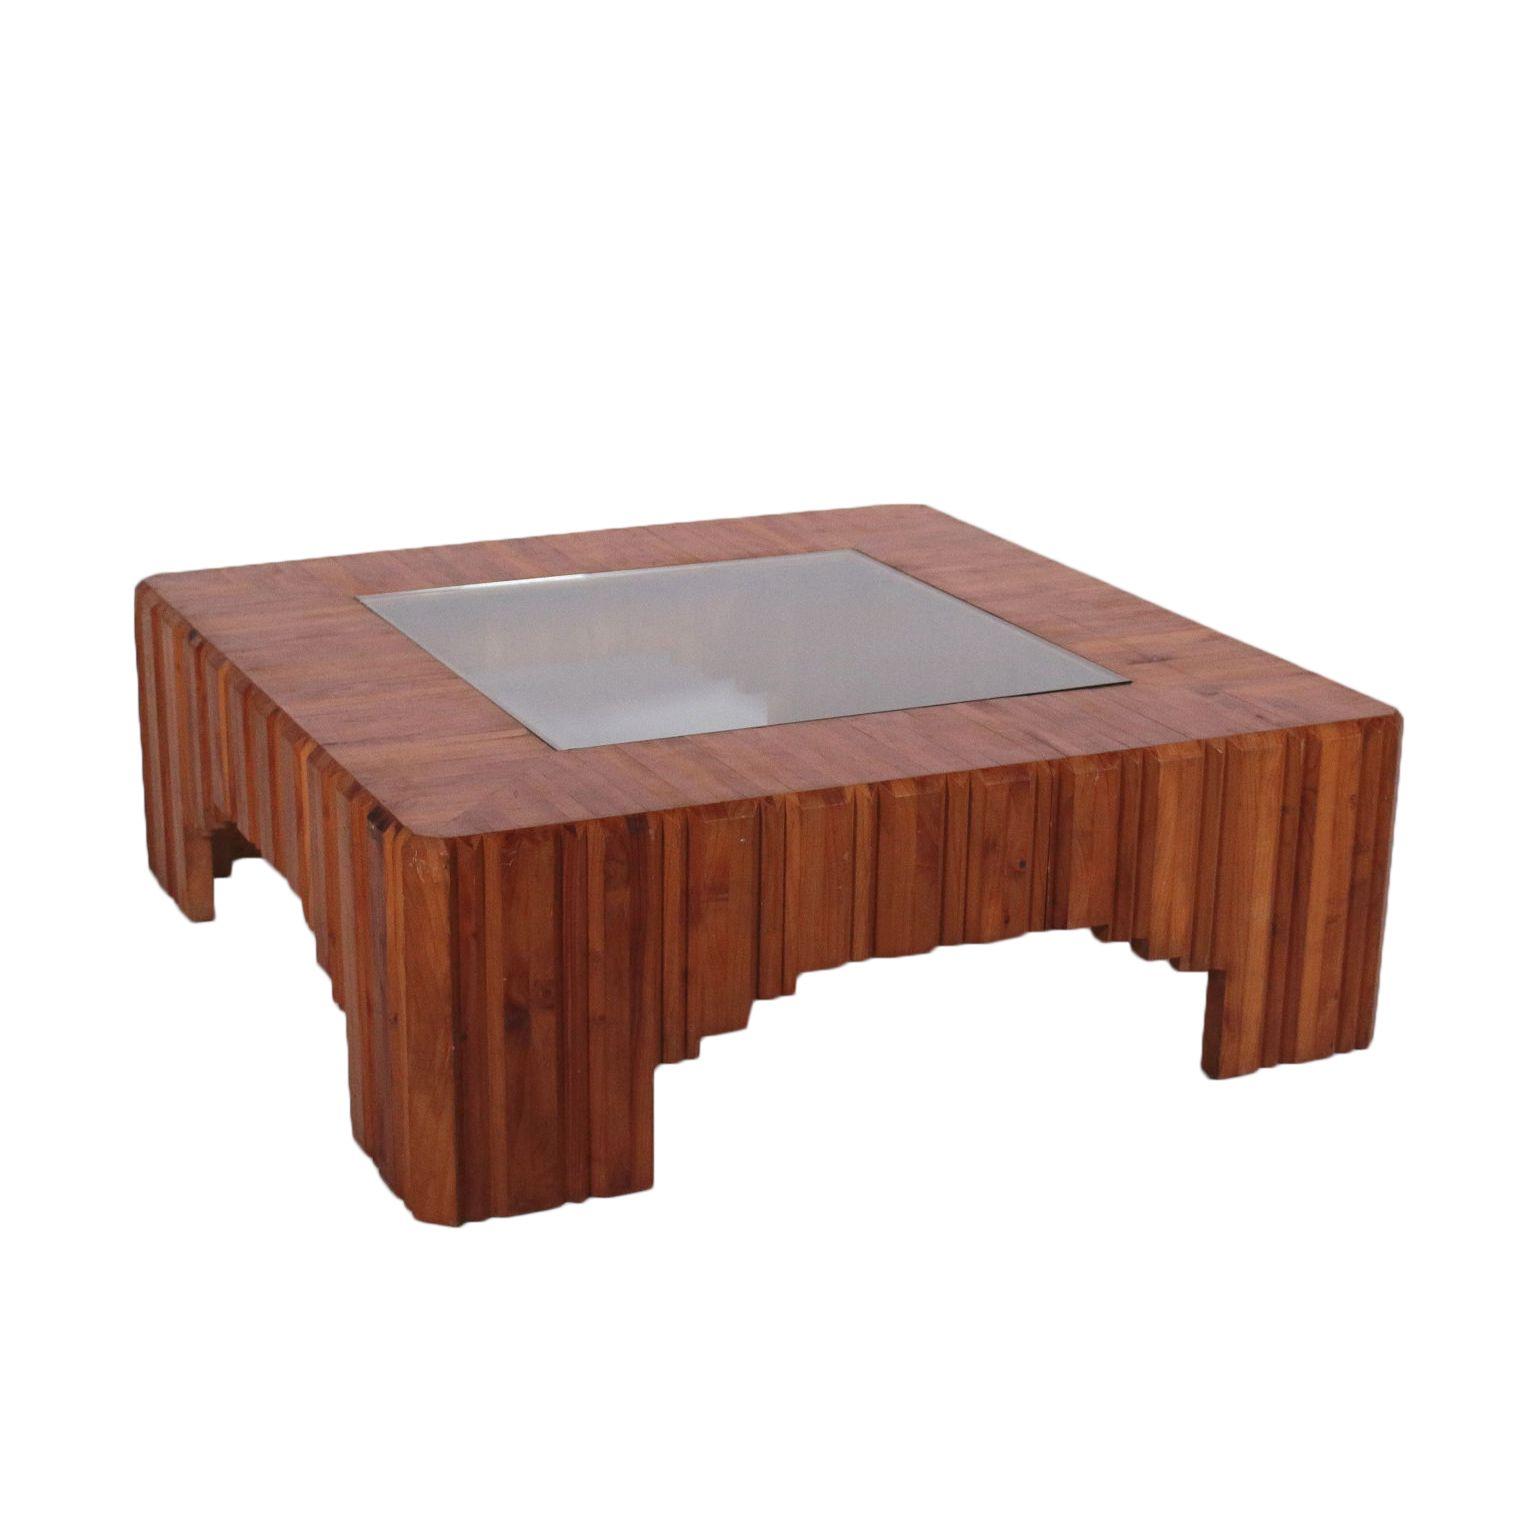 Tisch Kiefernholz Glas Italien 70er Jahre Table Bois Verre Bois Table Basse